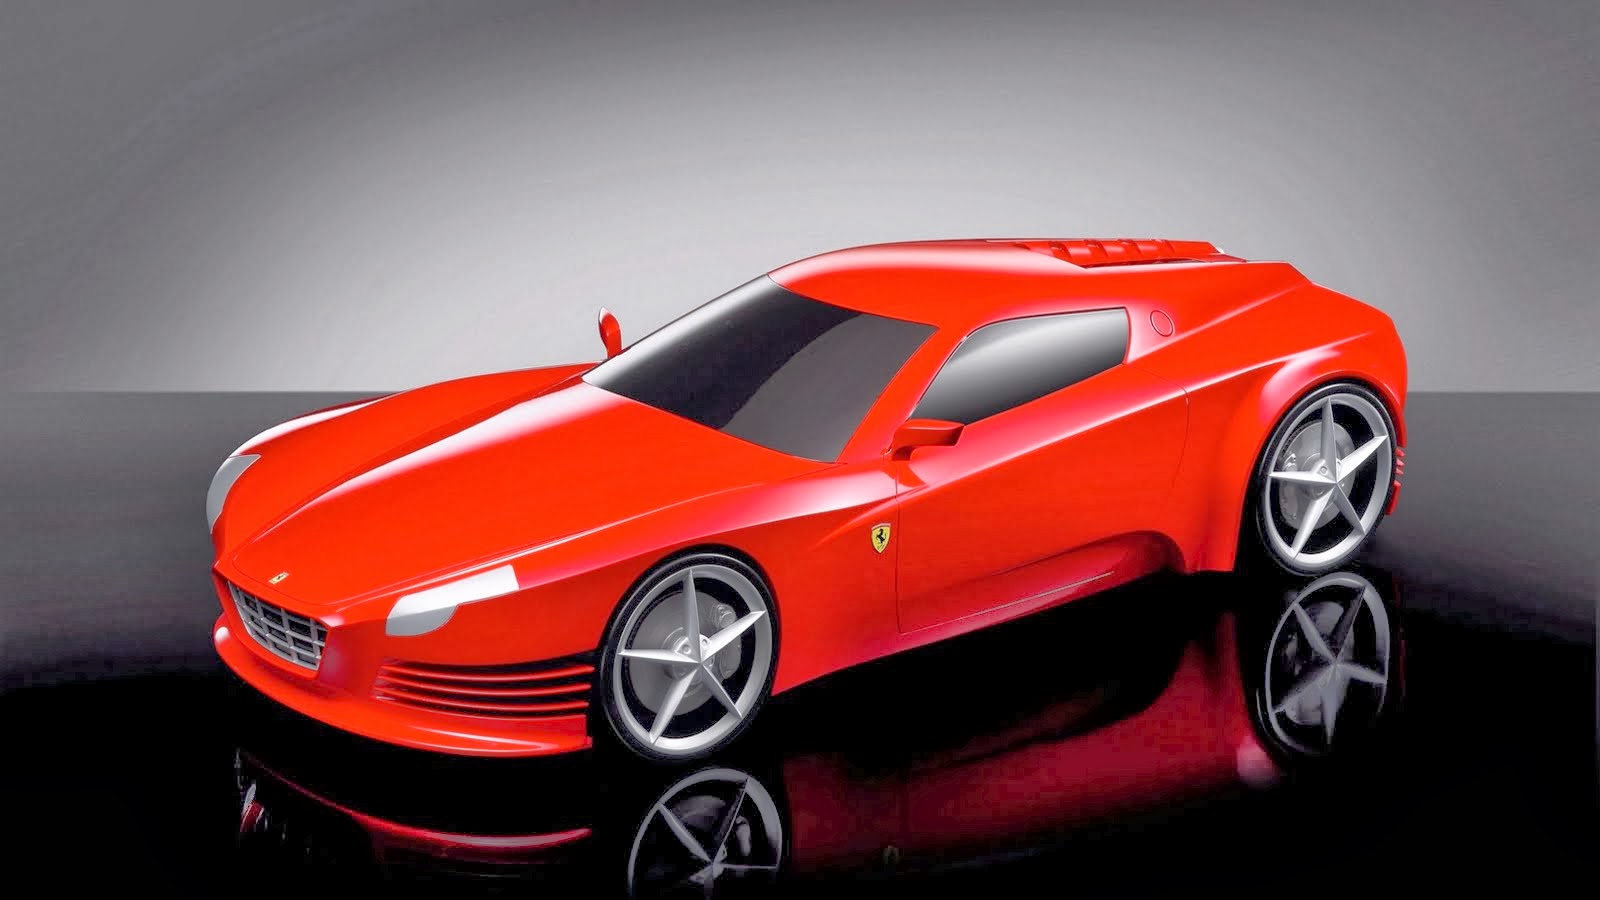 HD Wallpapers Mela: Beautiful Cars Wallpapers 2014